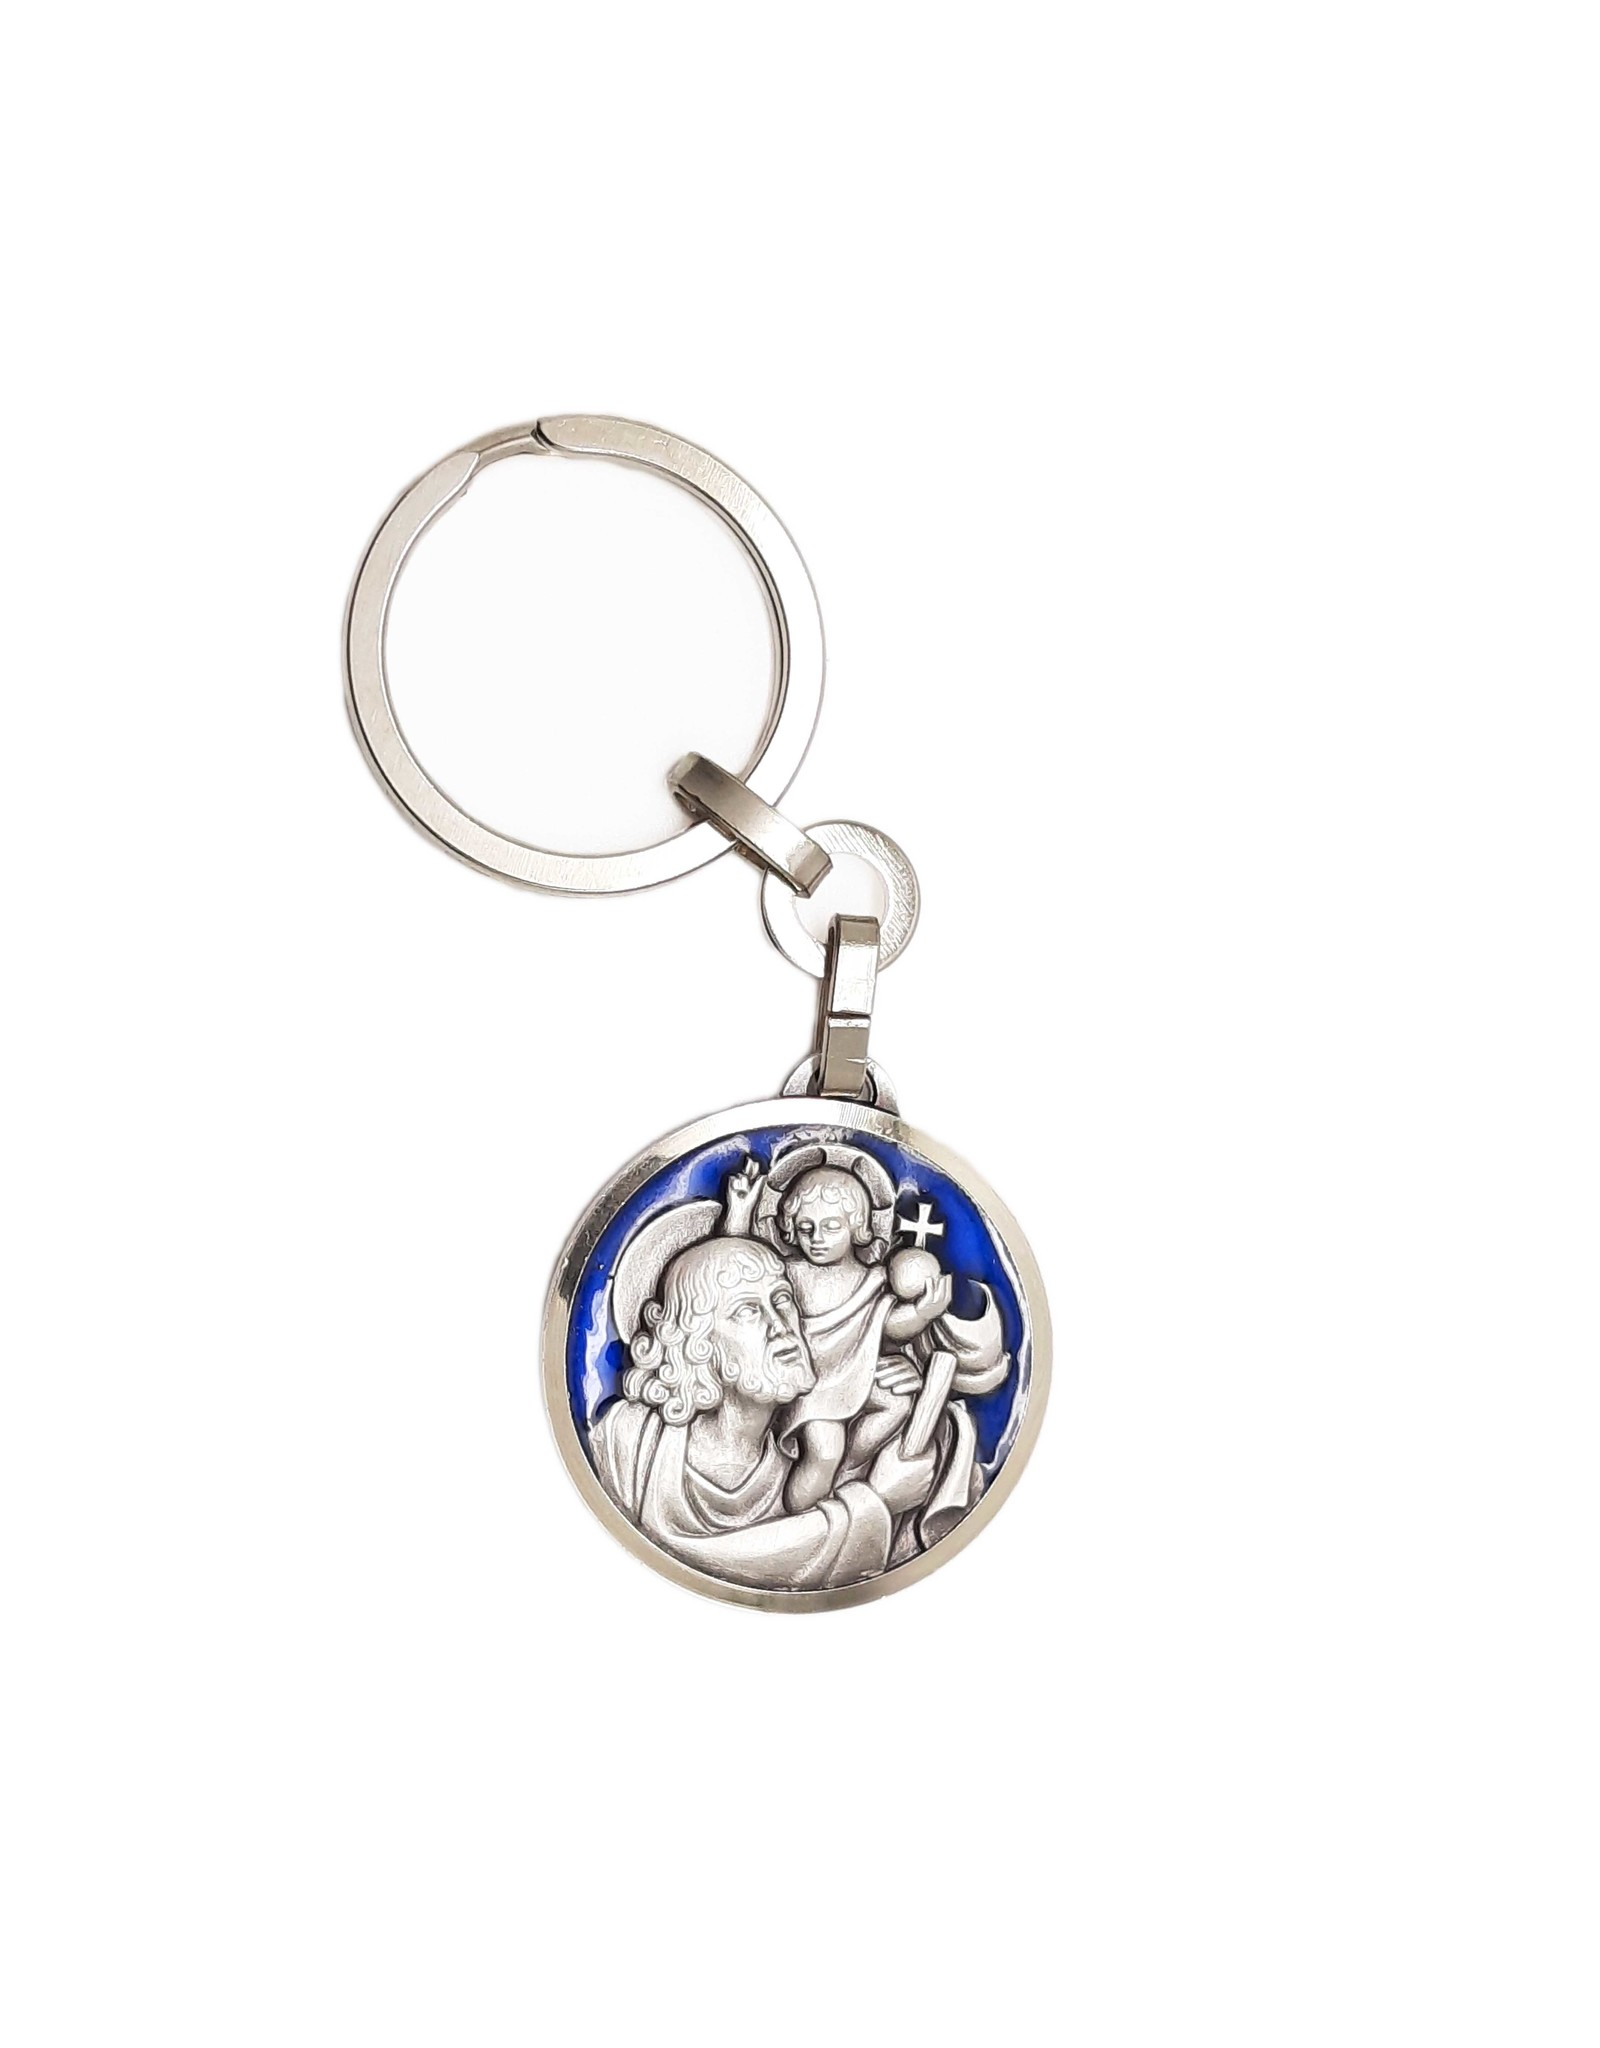 Porte-clés Saint-Christophe métal émaillé bleu